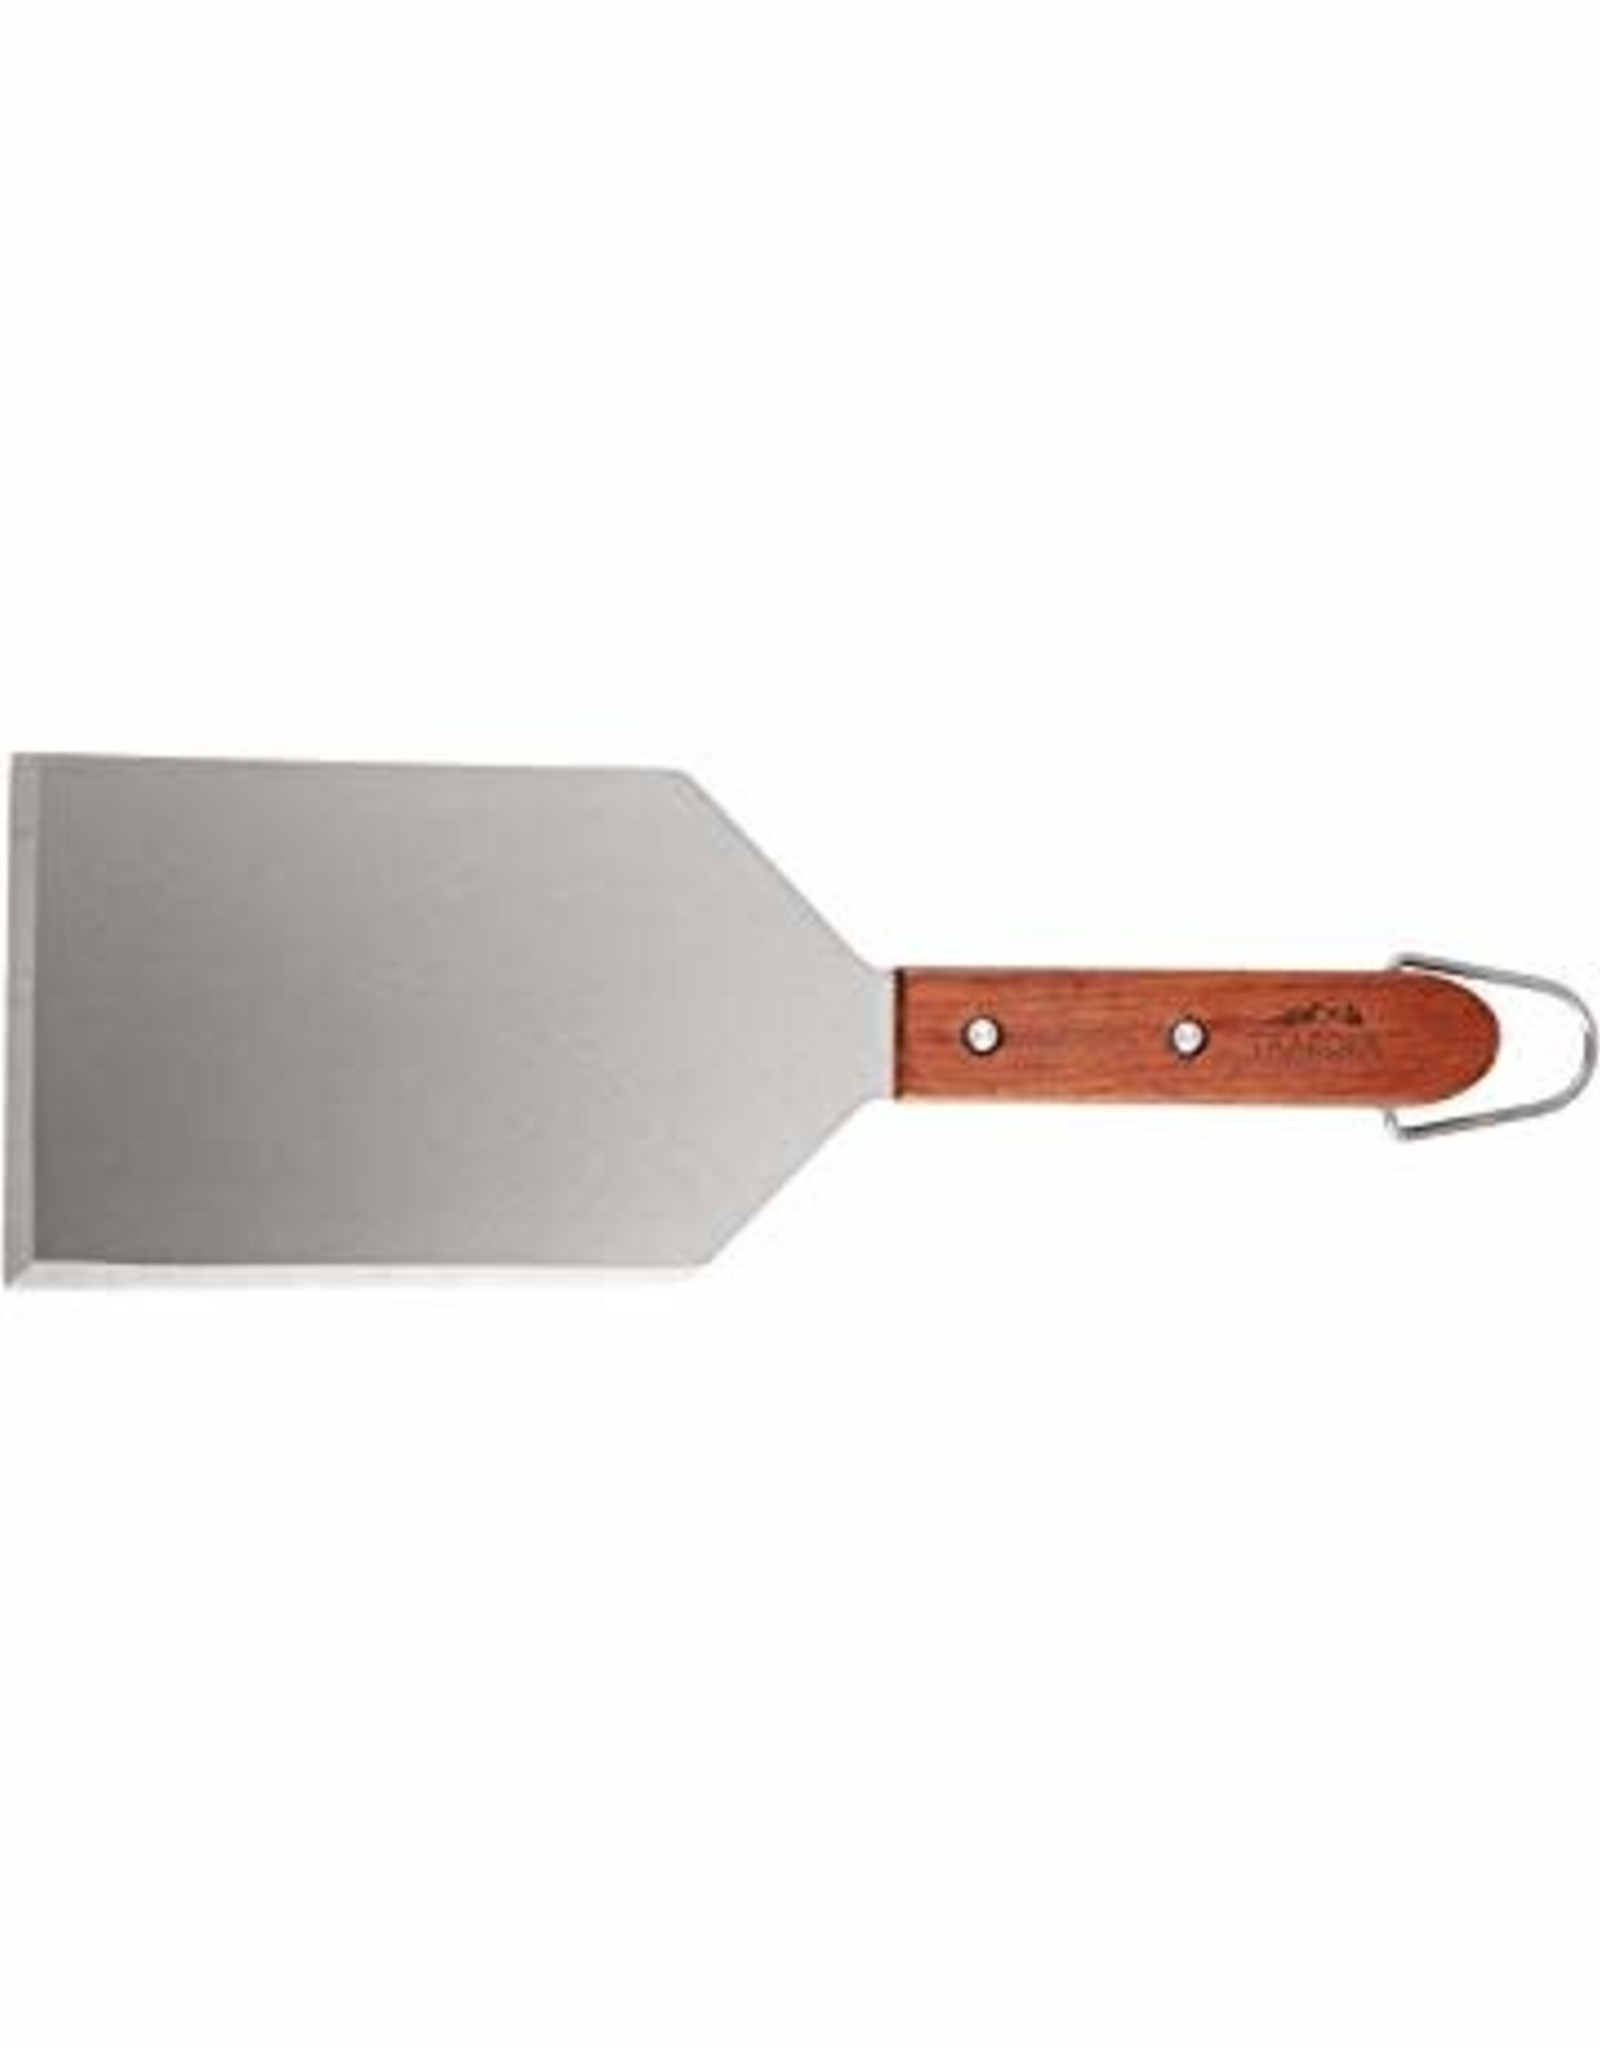 Traeger Traeger Large Meat BBQ Spatula - BAC417